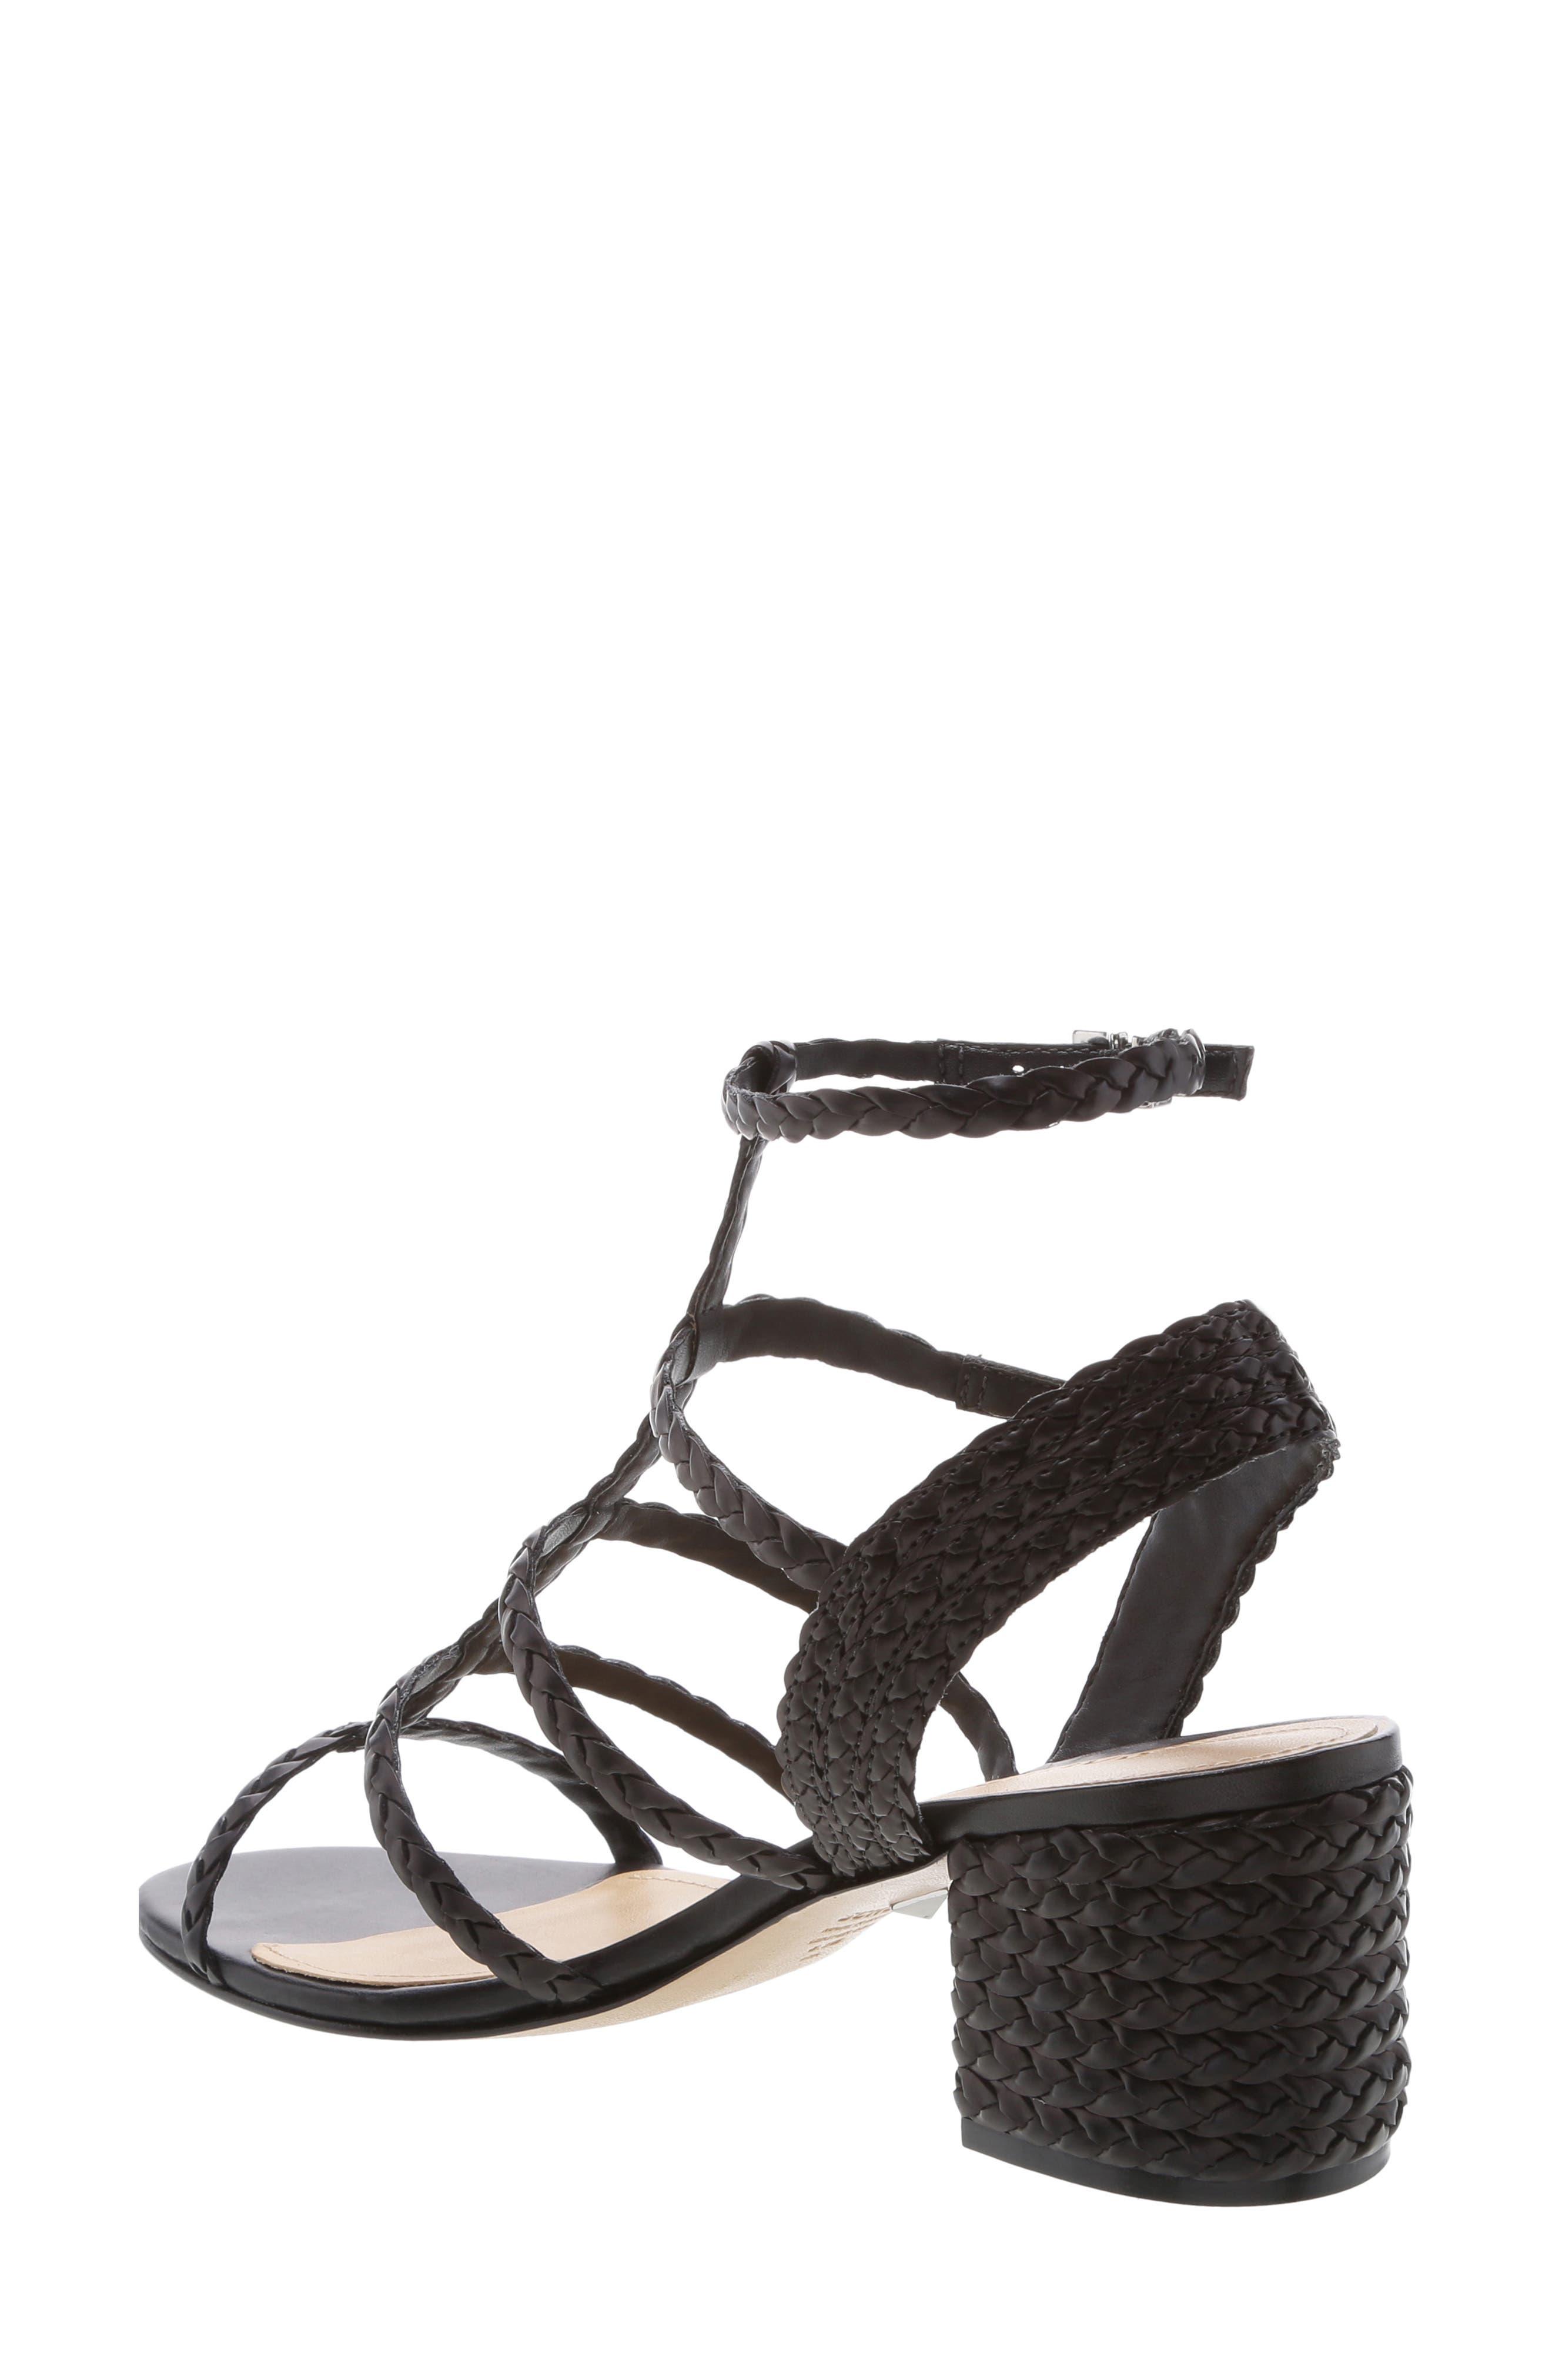 SCHUTZ, Rosalia Block Heel Sandal, Alternate thumbnail 2, color, BLACK LEATHER